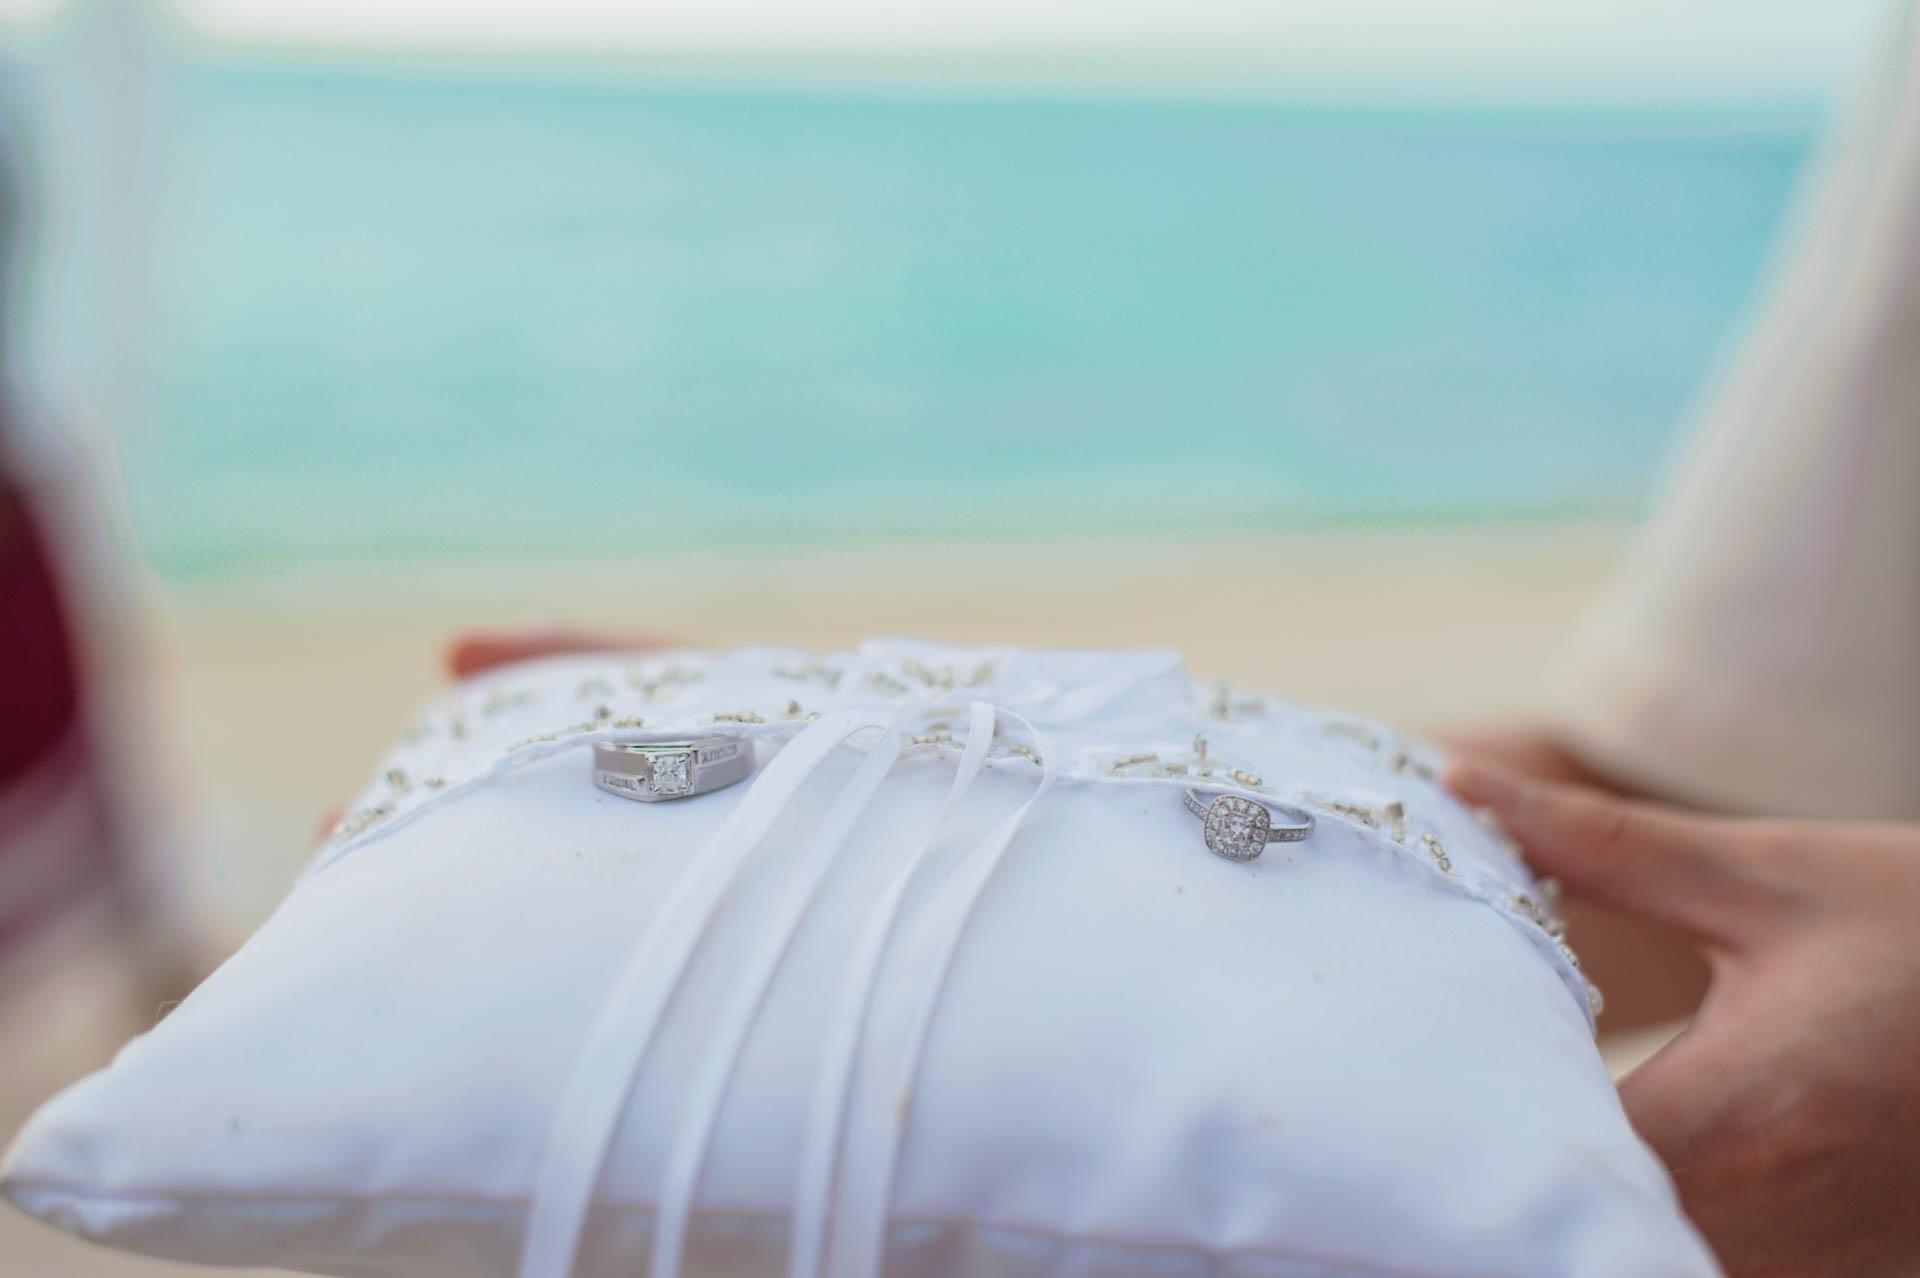 Chih Chao Yu Shan Destination Wedding at Residence Maldives 31